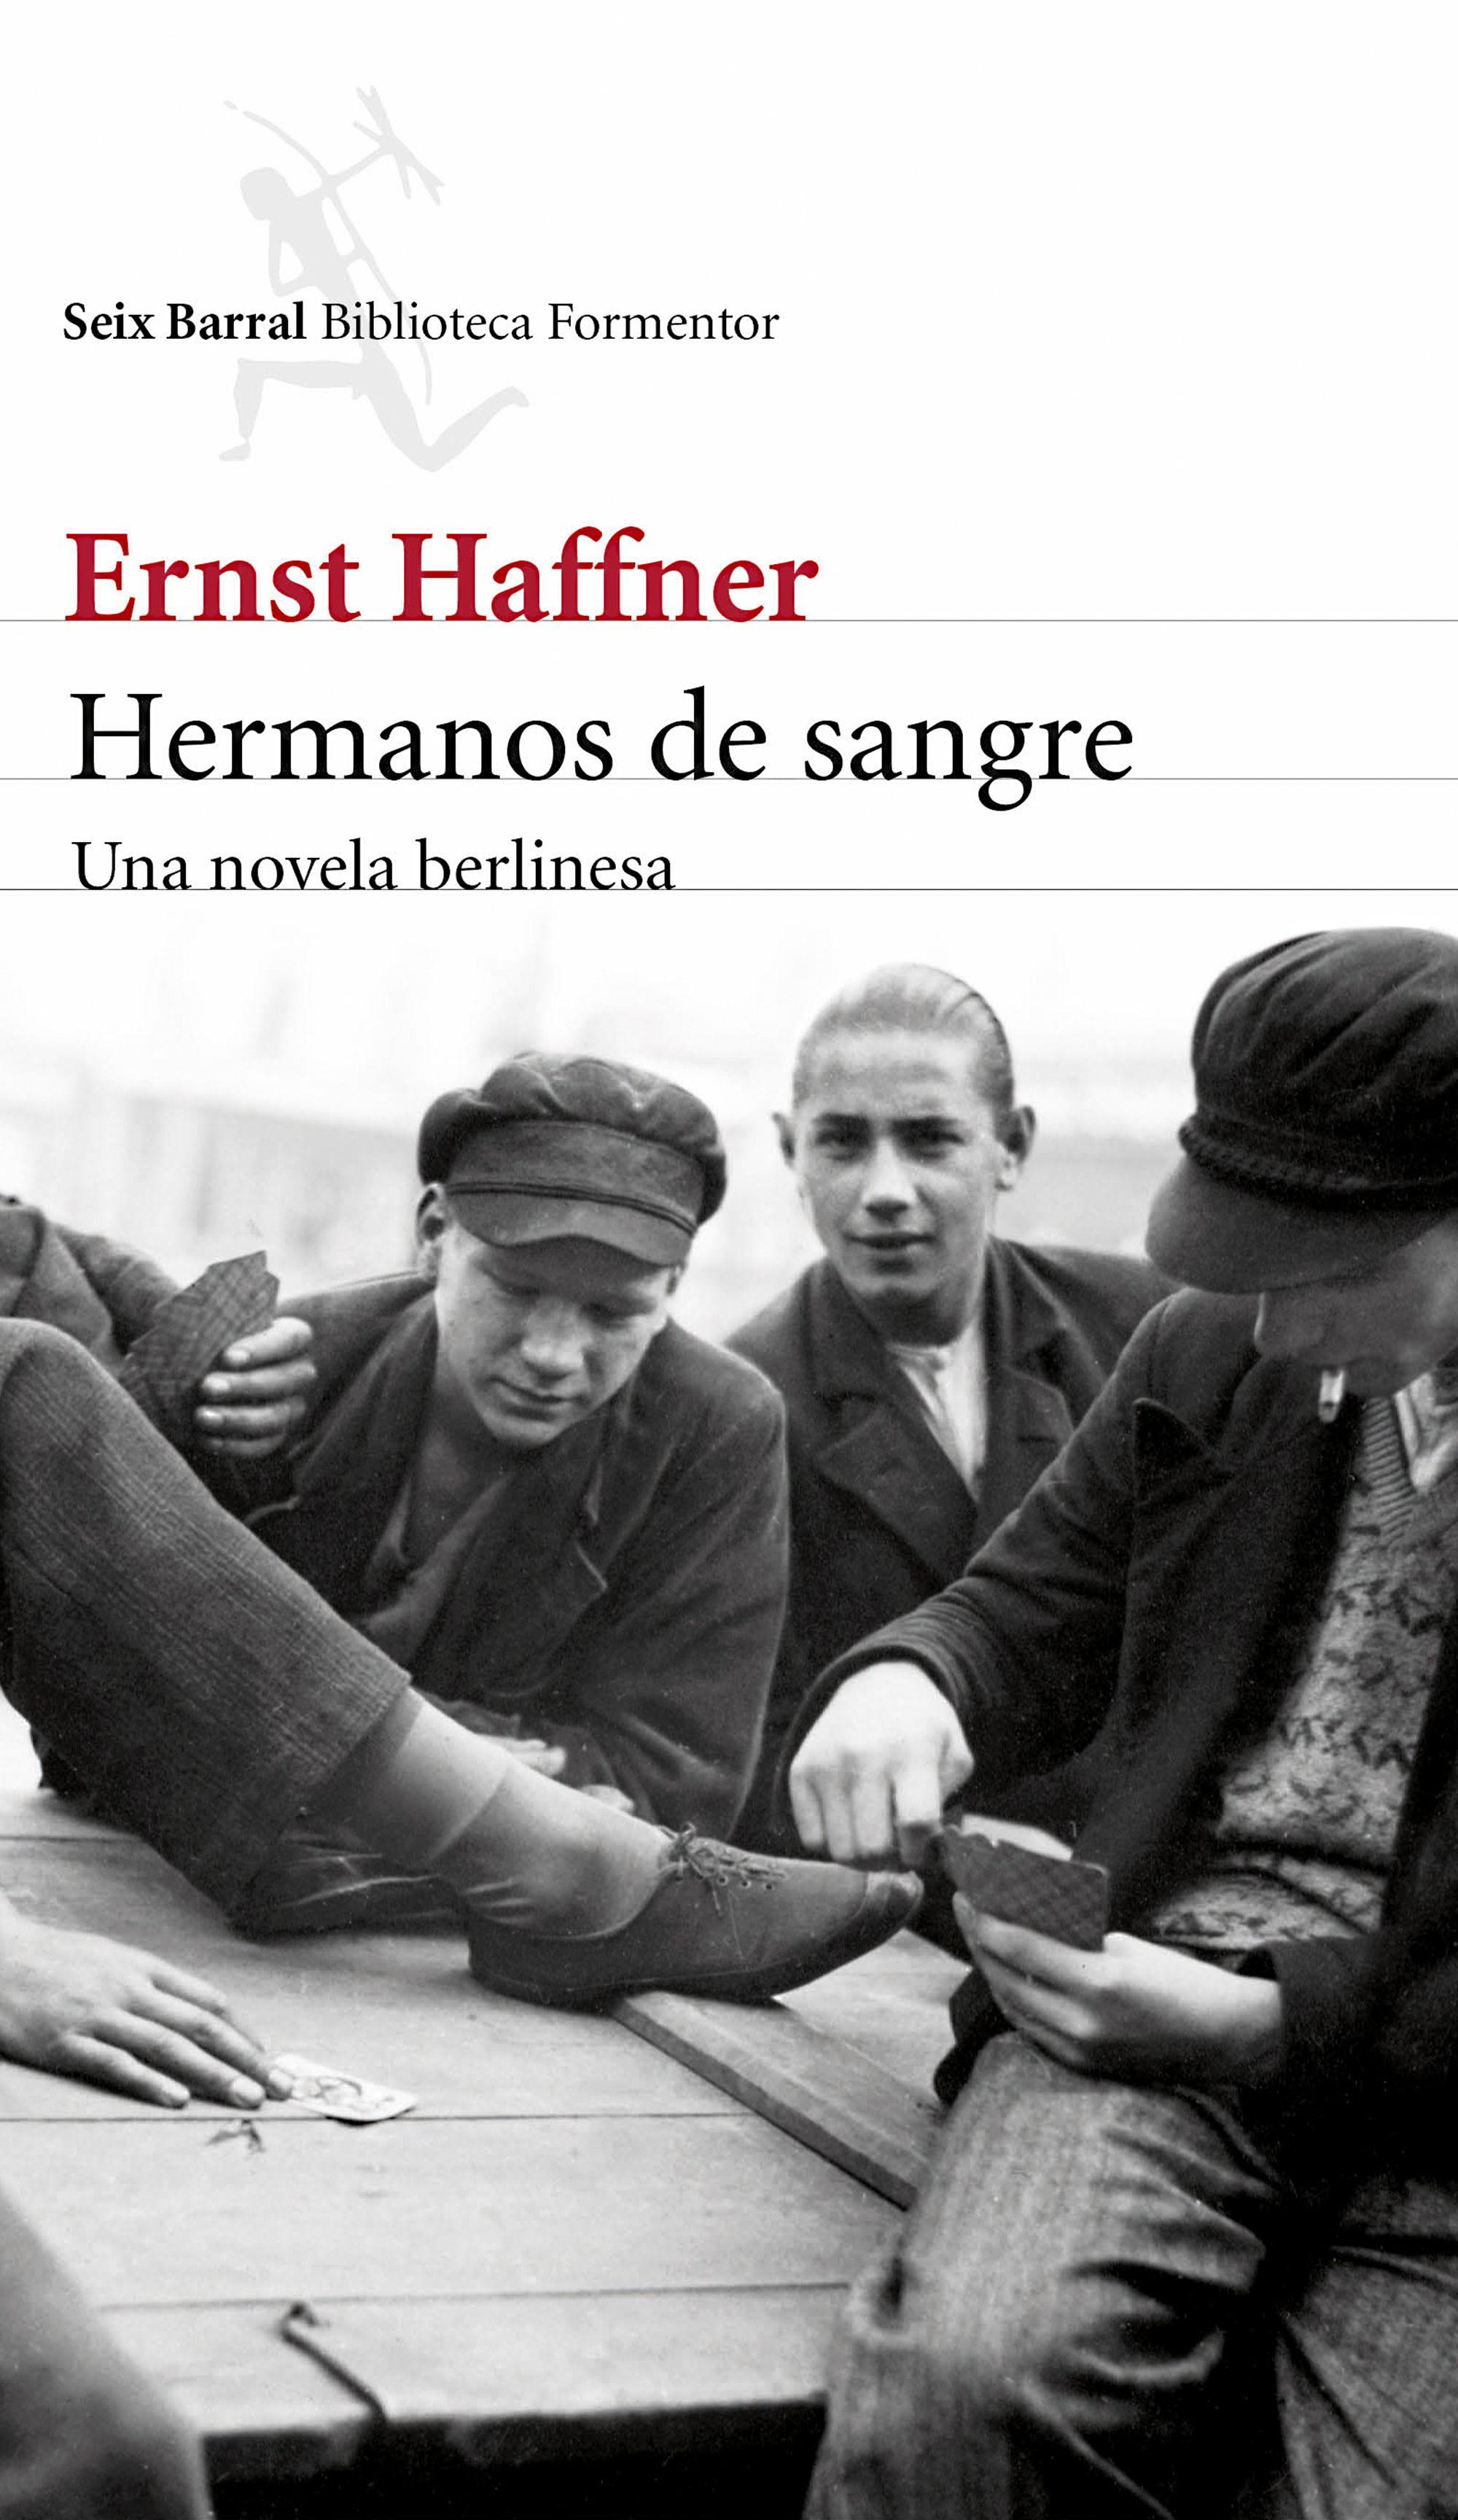 Hermanos de sangre de Ernst Haffner Editorial Seix Barral Signatura N HAF her